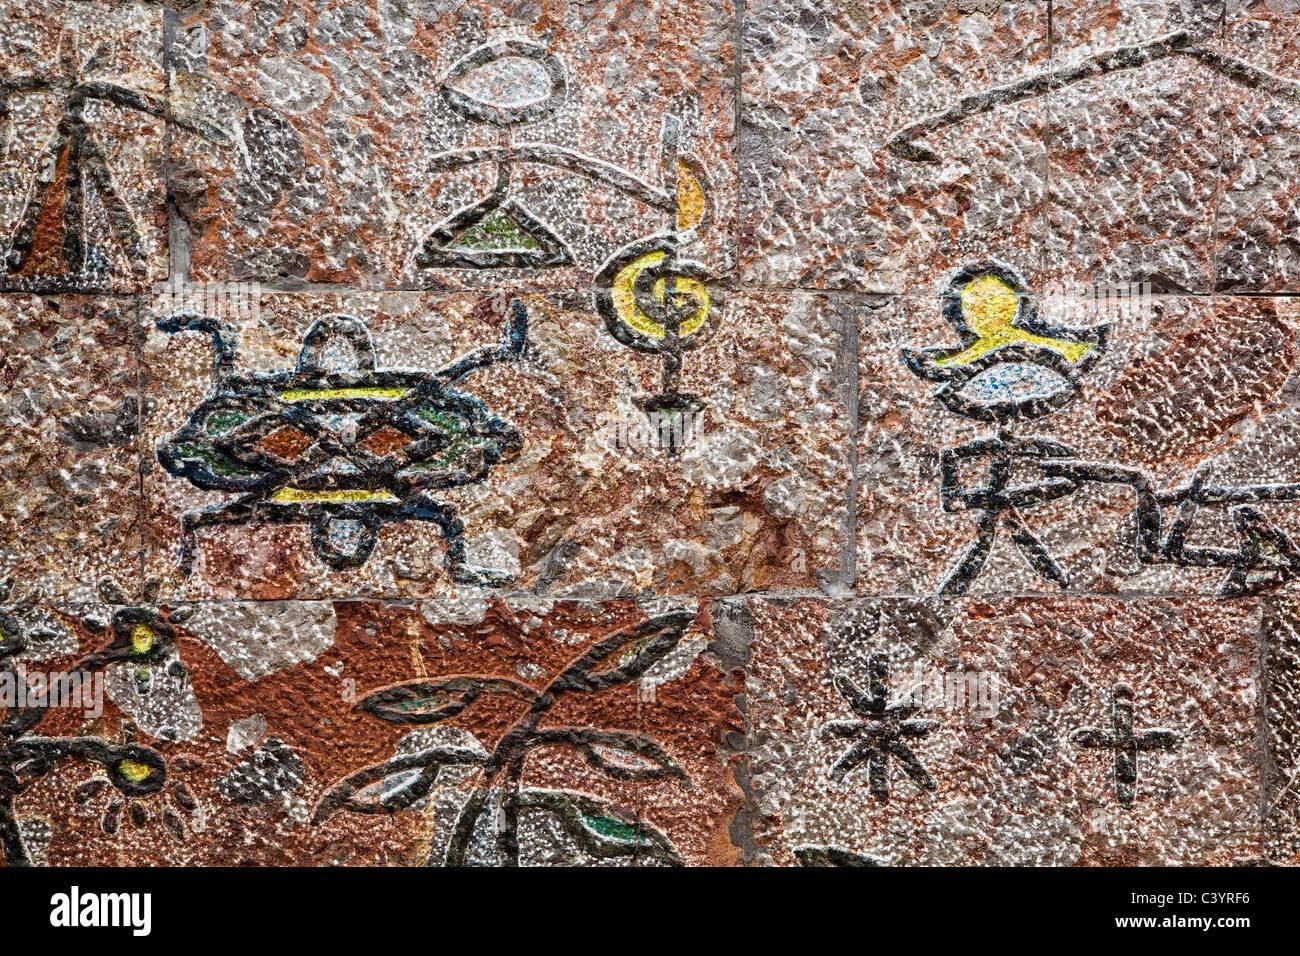 lijiang: ancient pictograph - Stock Image